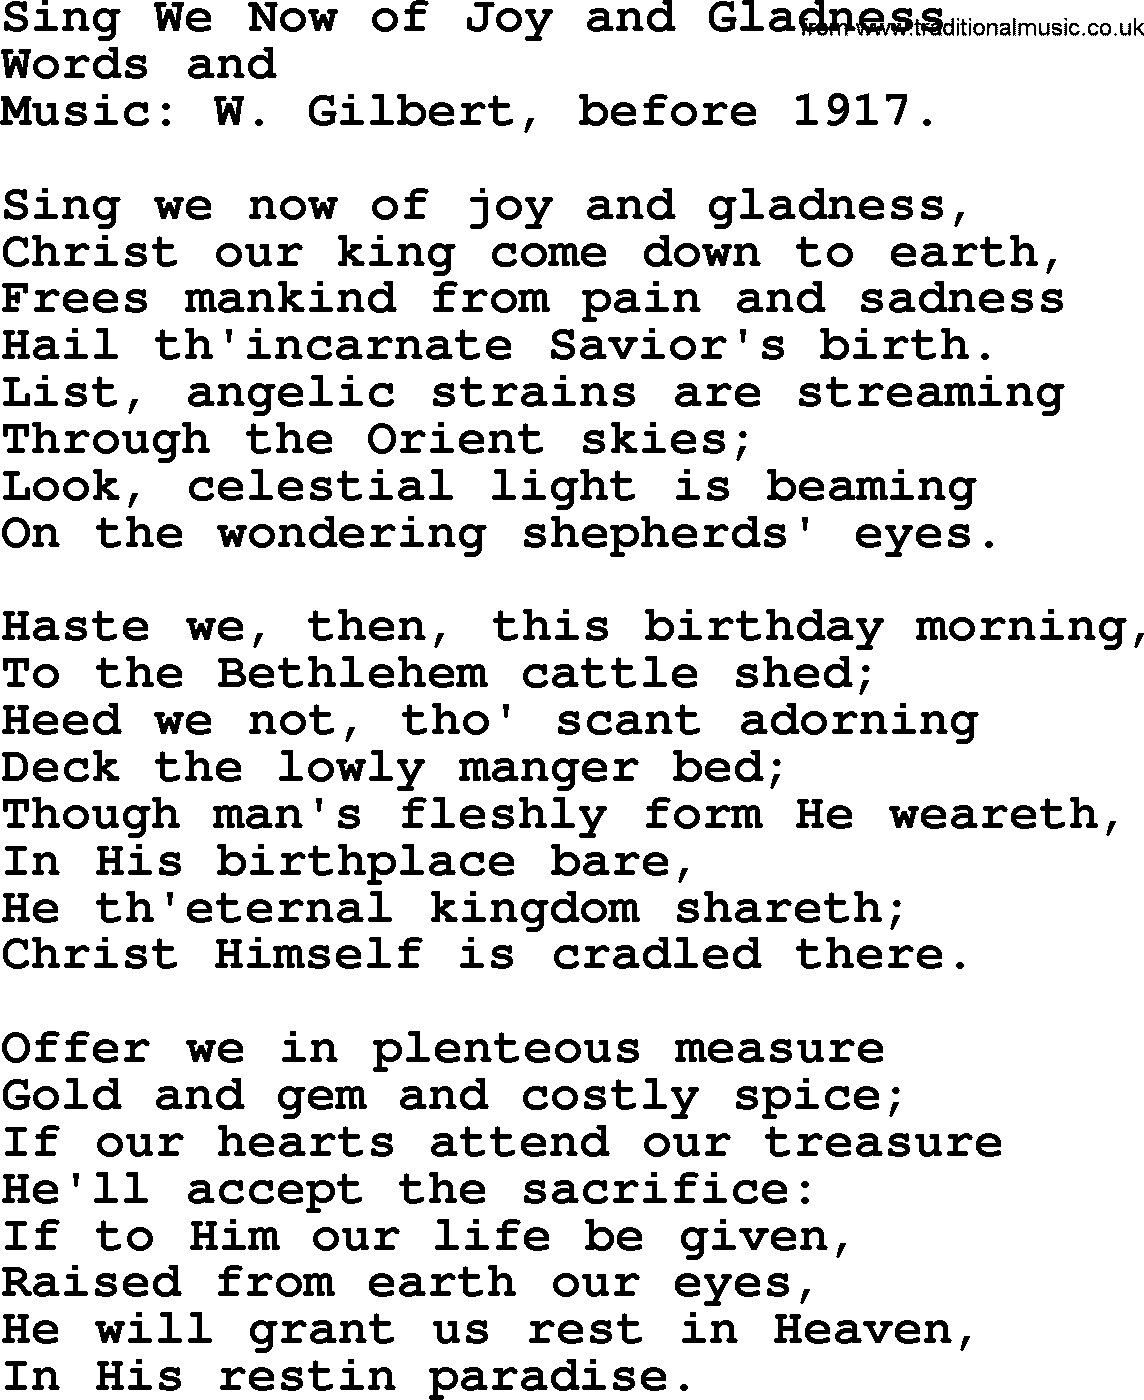 christmas light coldplay lyrics 2000 subaru outback engine diagram song